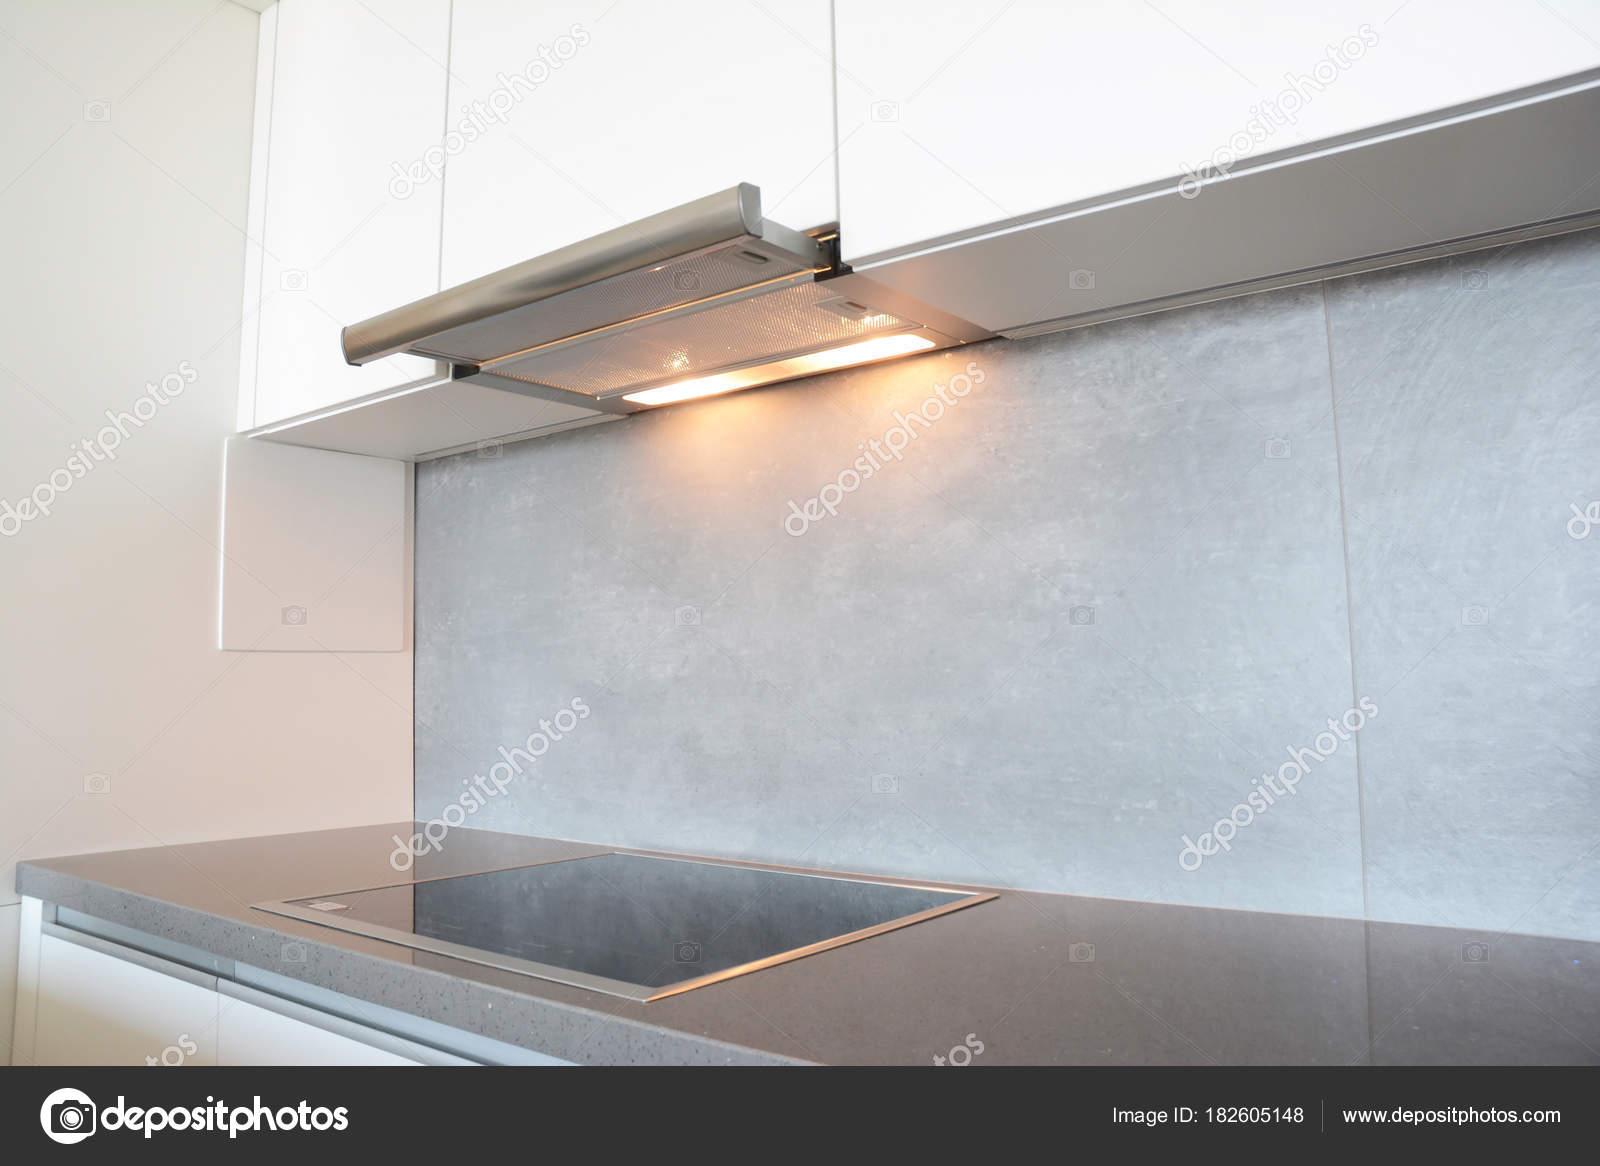 Chiuda In Su Moderno Aria Aspiratore Cucina Ventilatore O Cappa